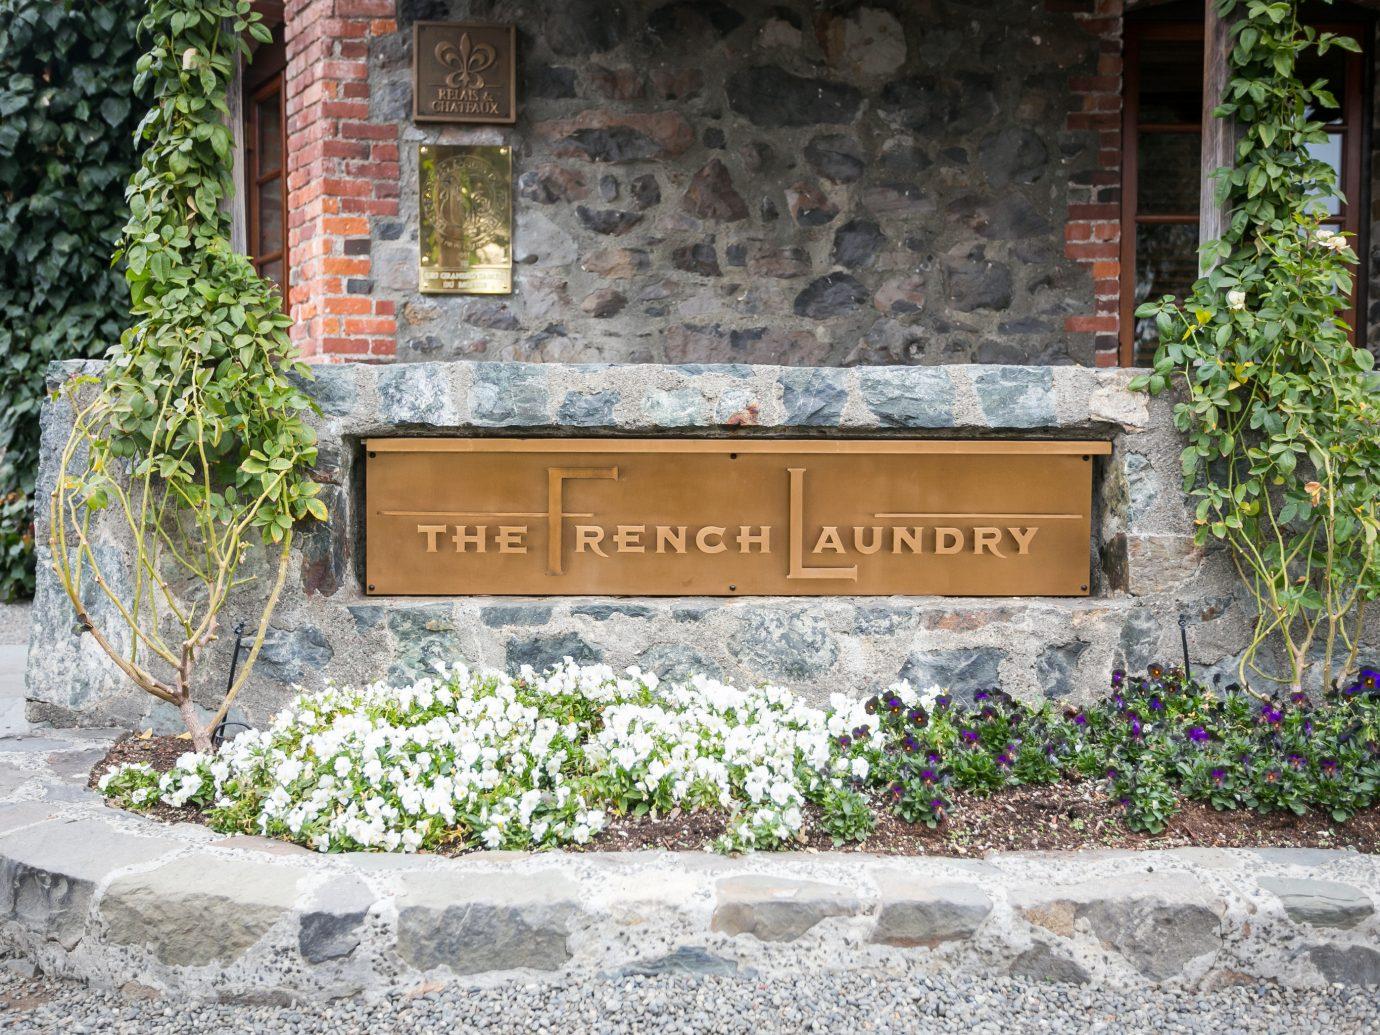 Food + Drink Girls Getaways Trip Ideas Weekend Getaways outdoor ground sign wall Garden yard Courtyard home estate backyard memorial plant stone